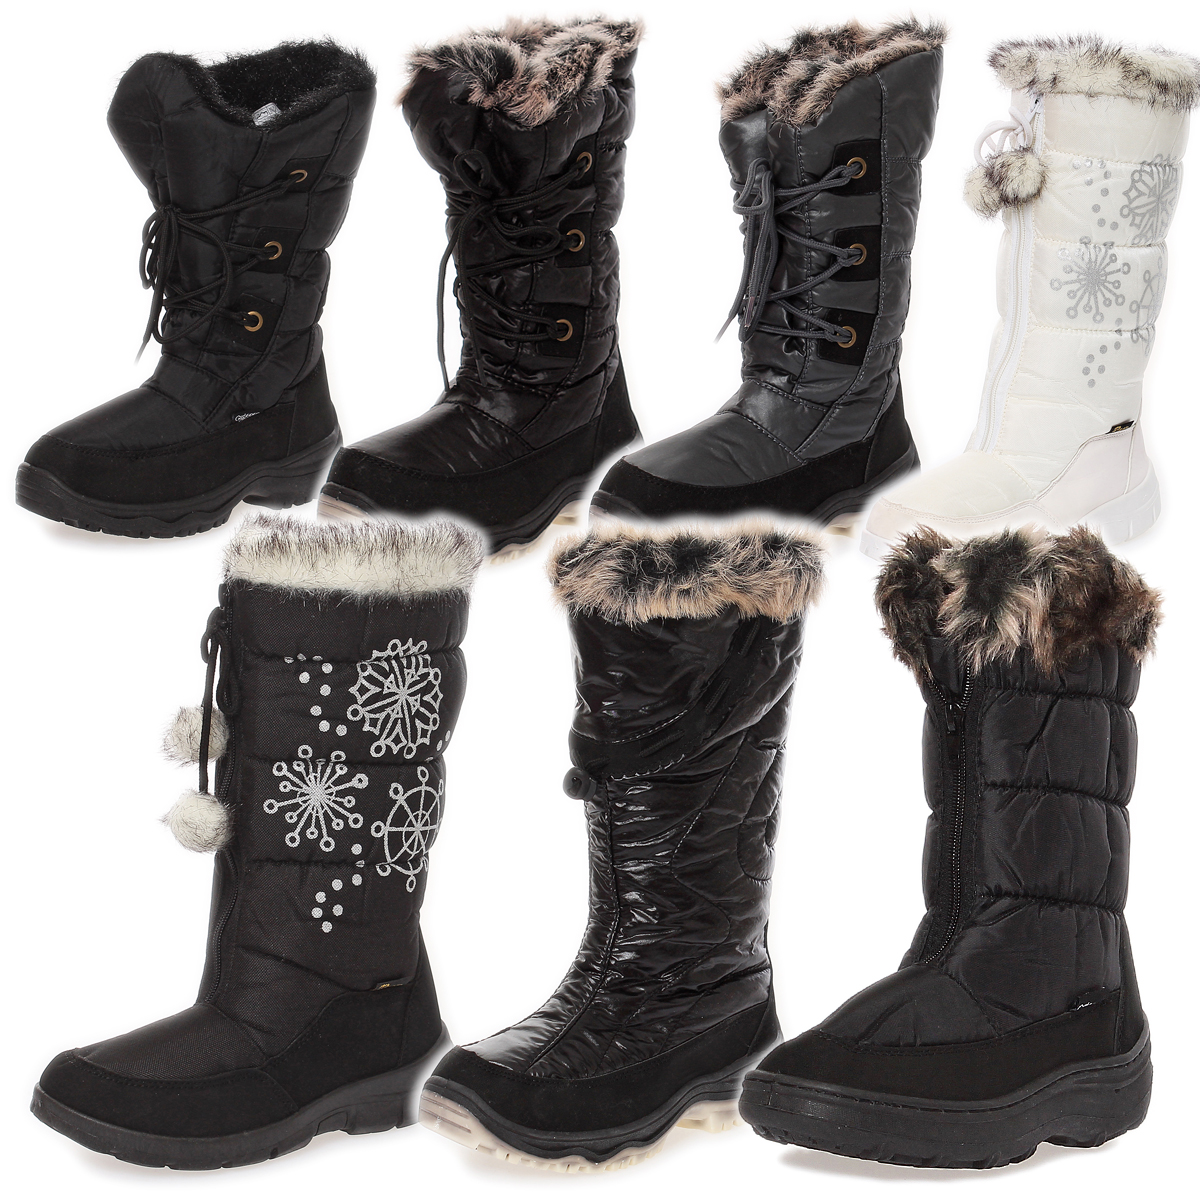 donna stivali invernali stivali termici stivali da neve. Black Bedroom Furniture Sets. Home Design Ideas